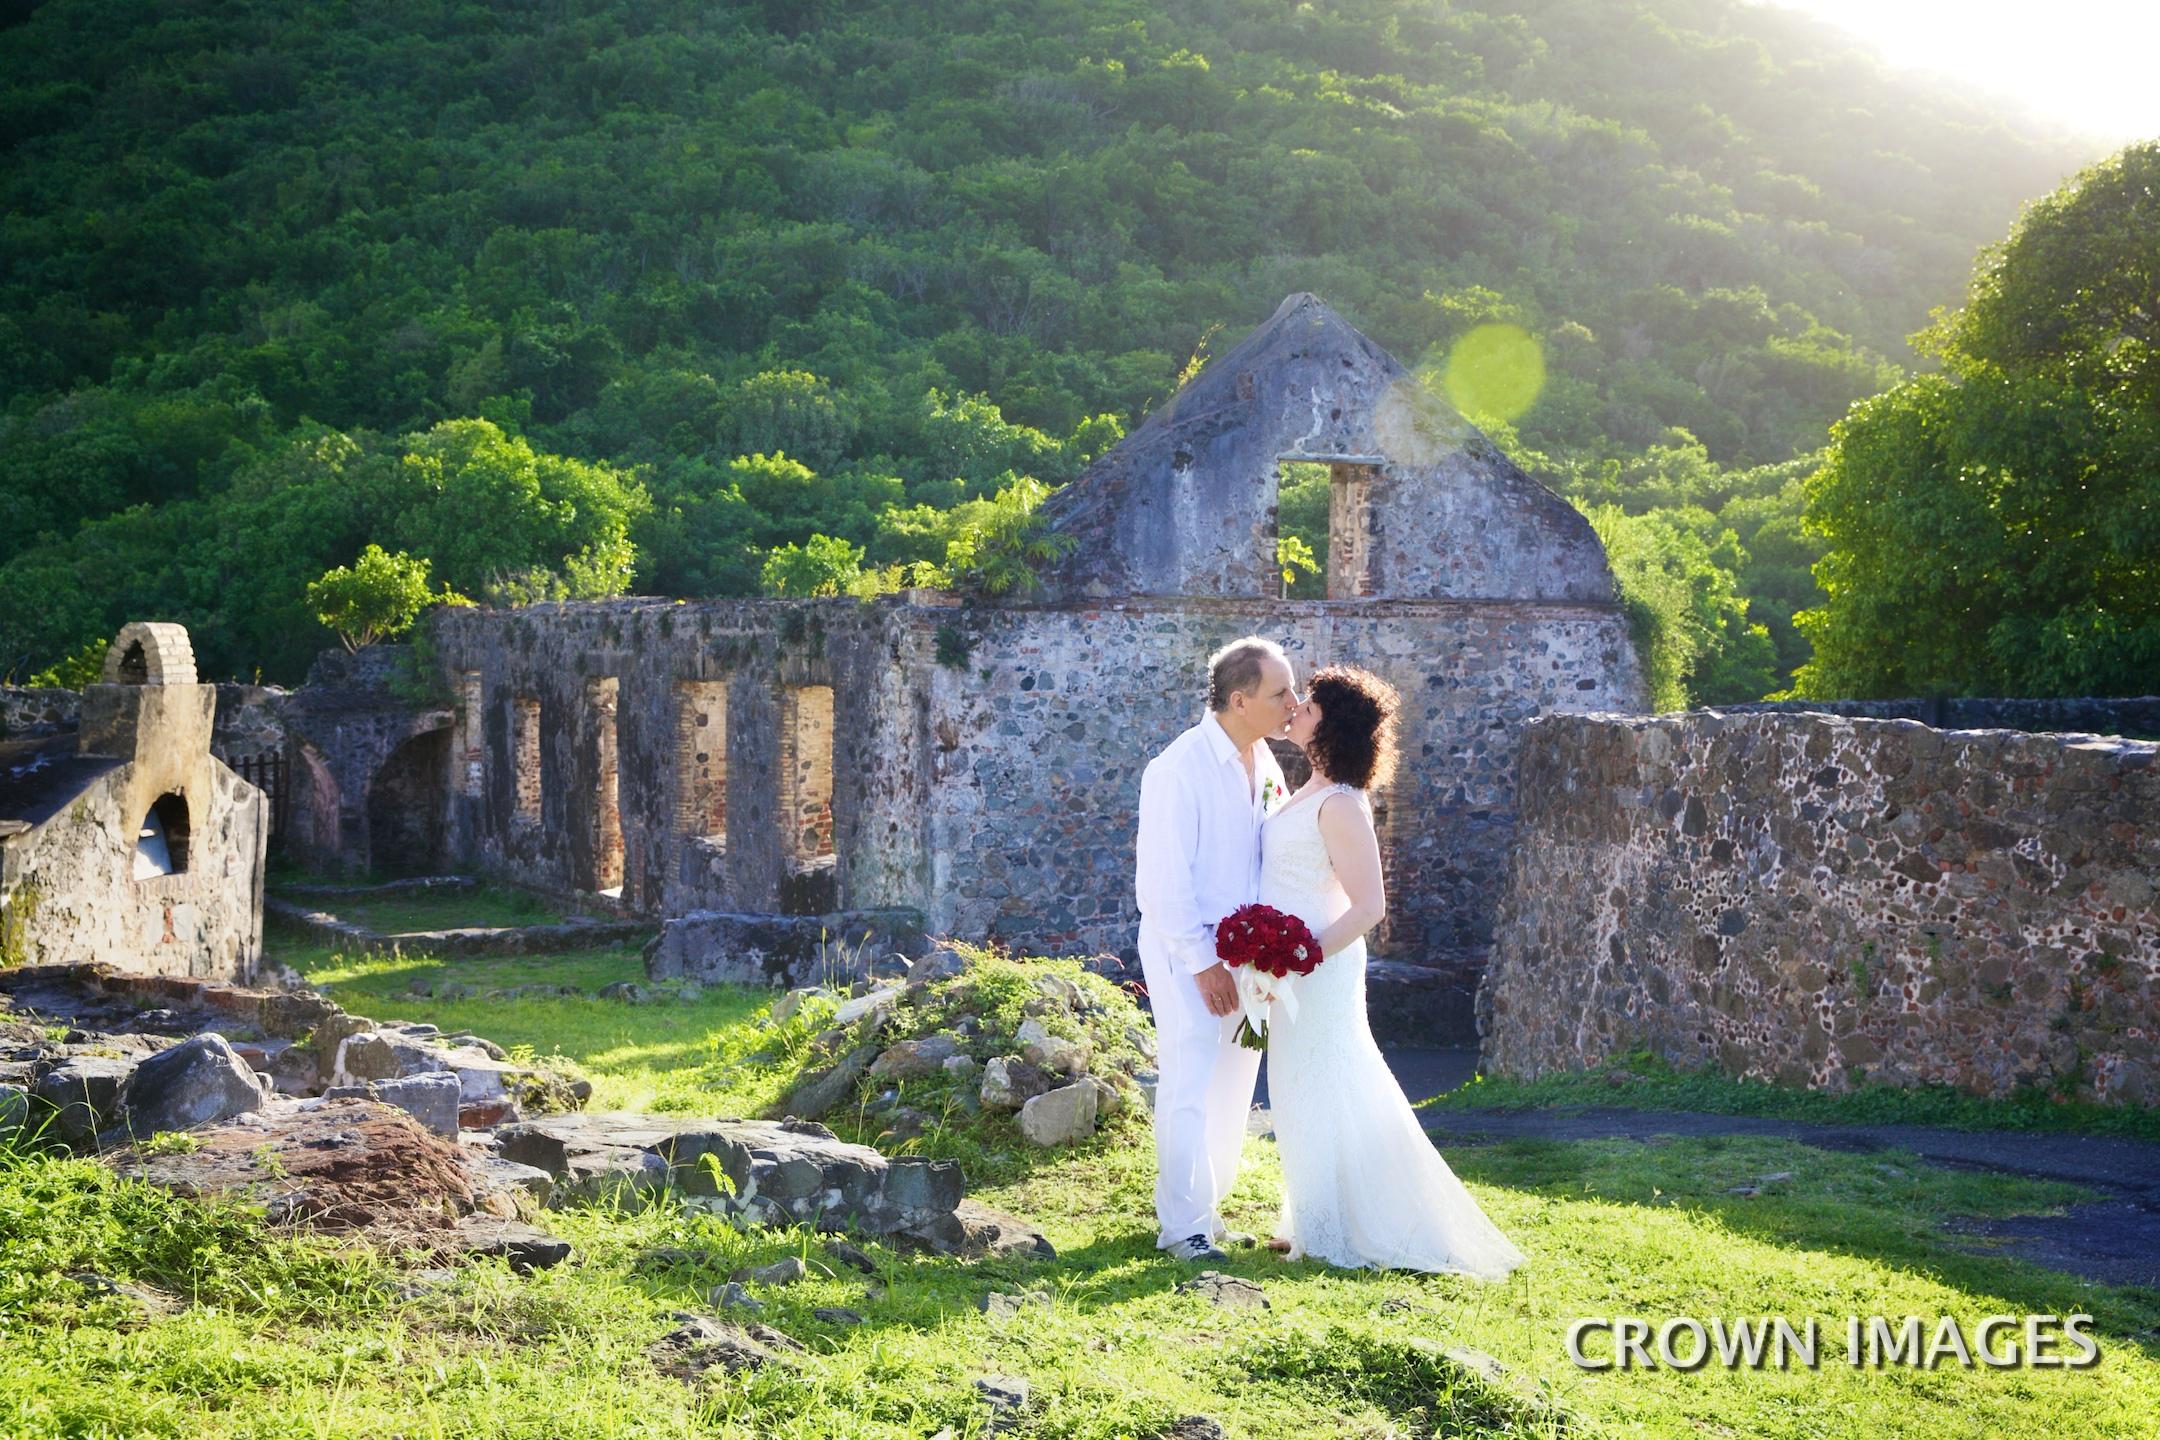 st john wedding photos in the ruins